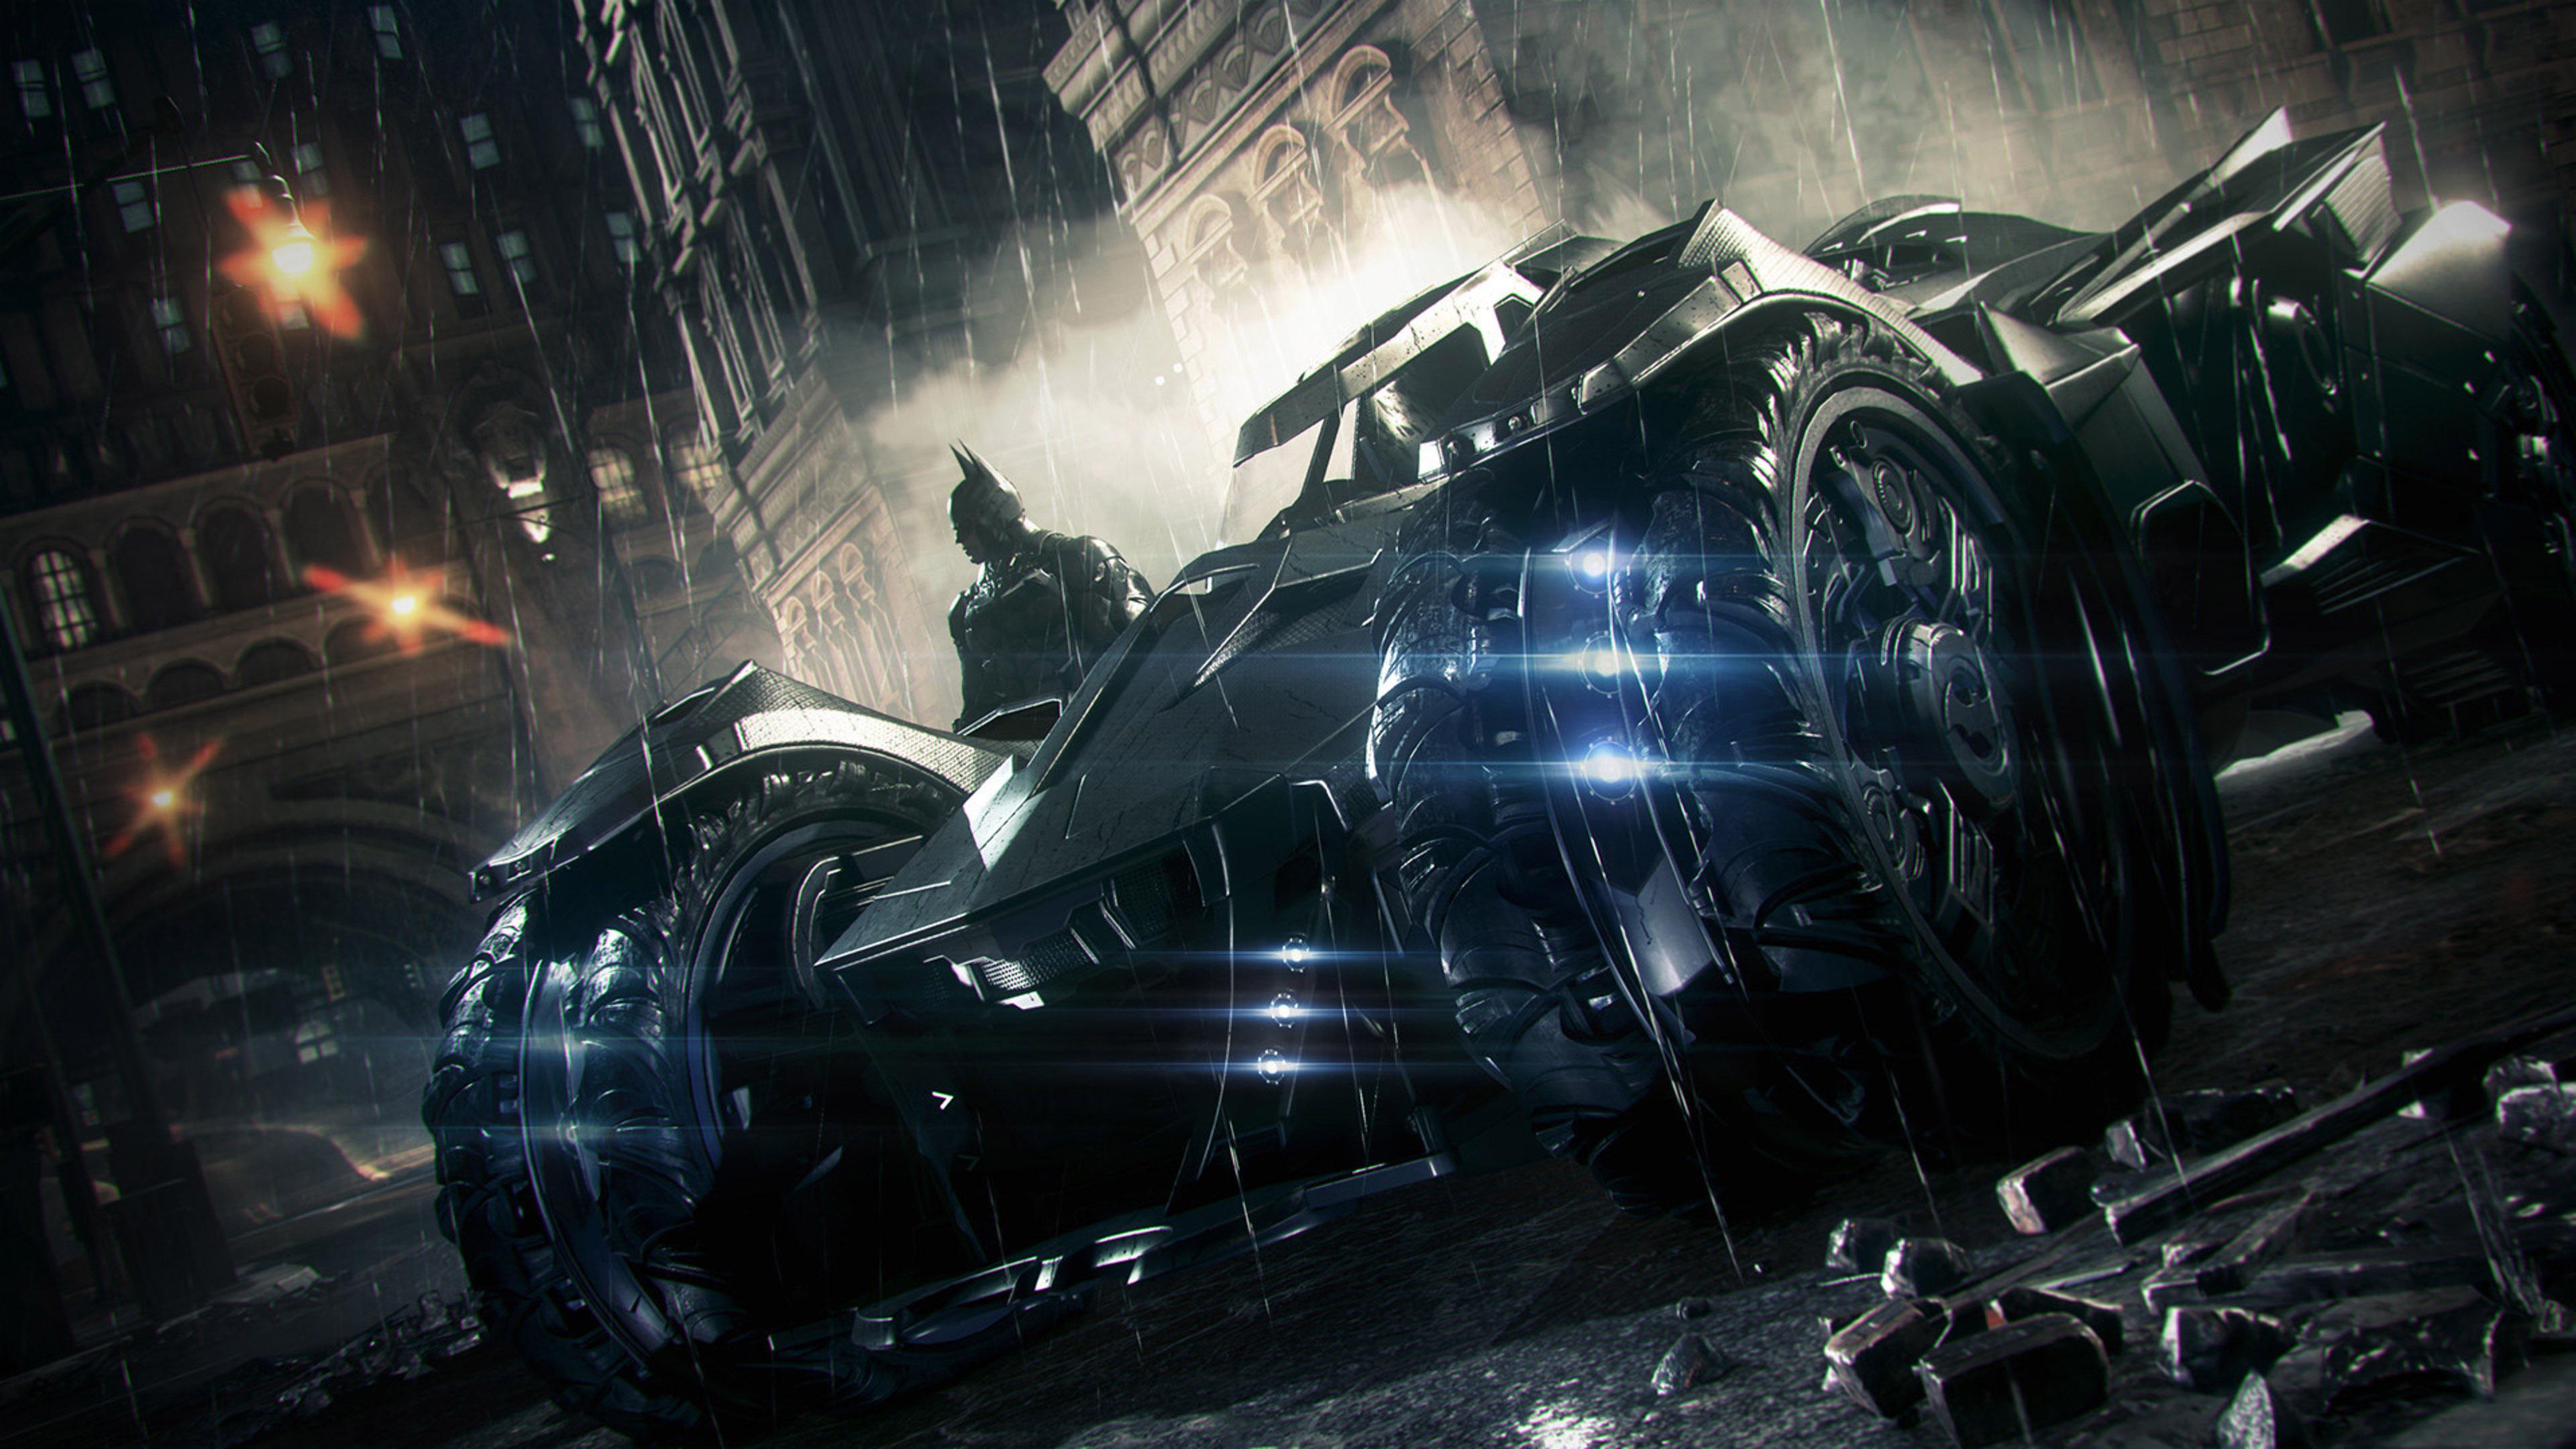 Exclusive 2014 Batmobile Batman Arkham Knight HD Wallpapers 3840x2160